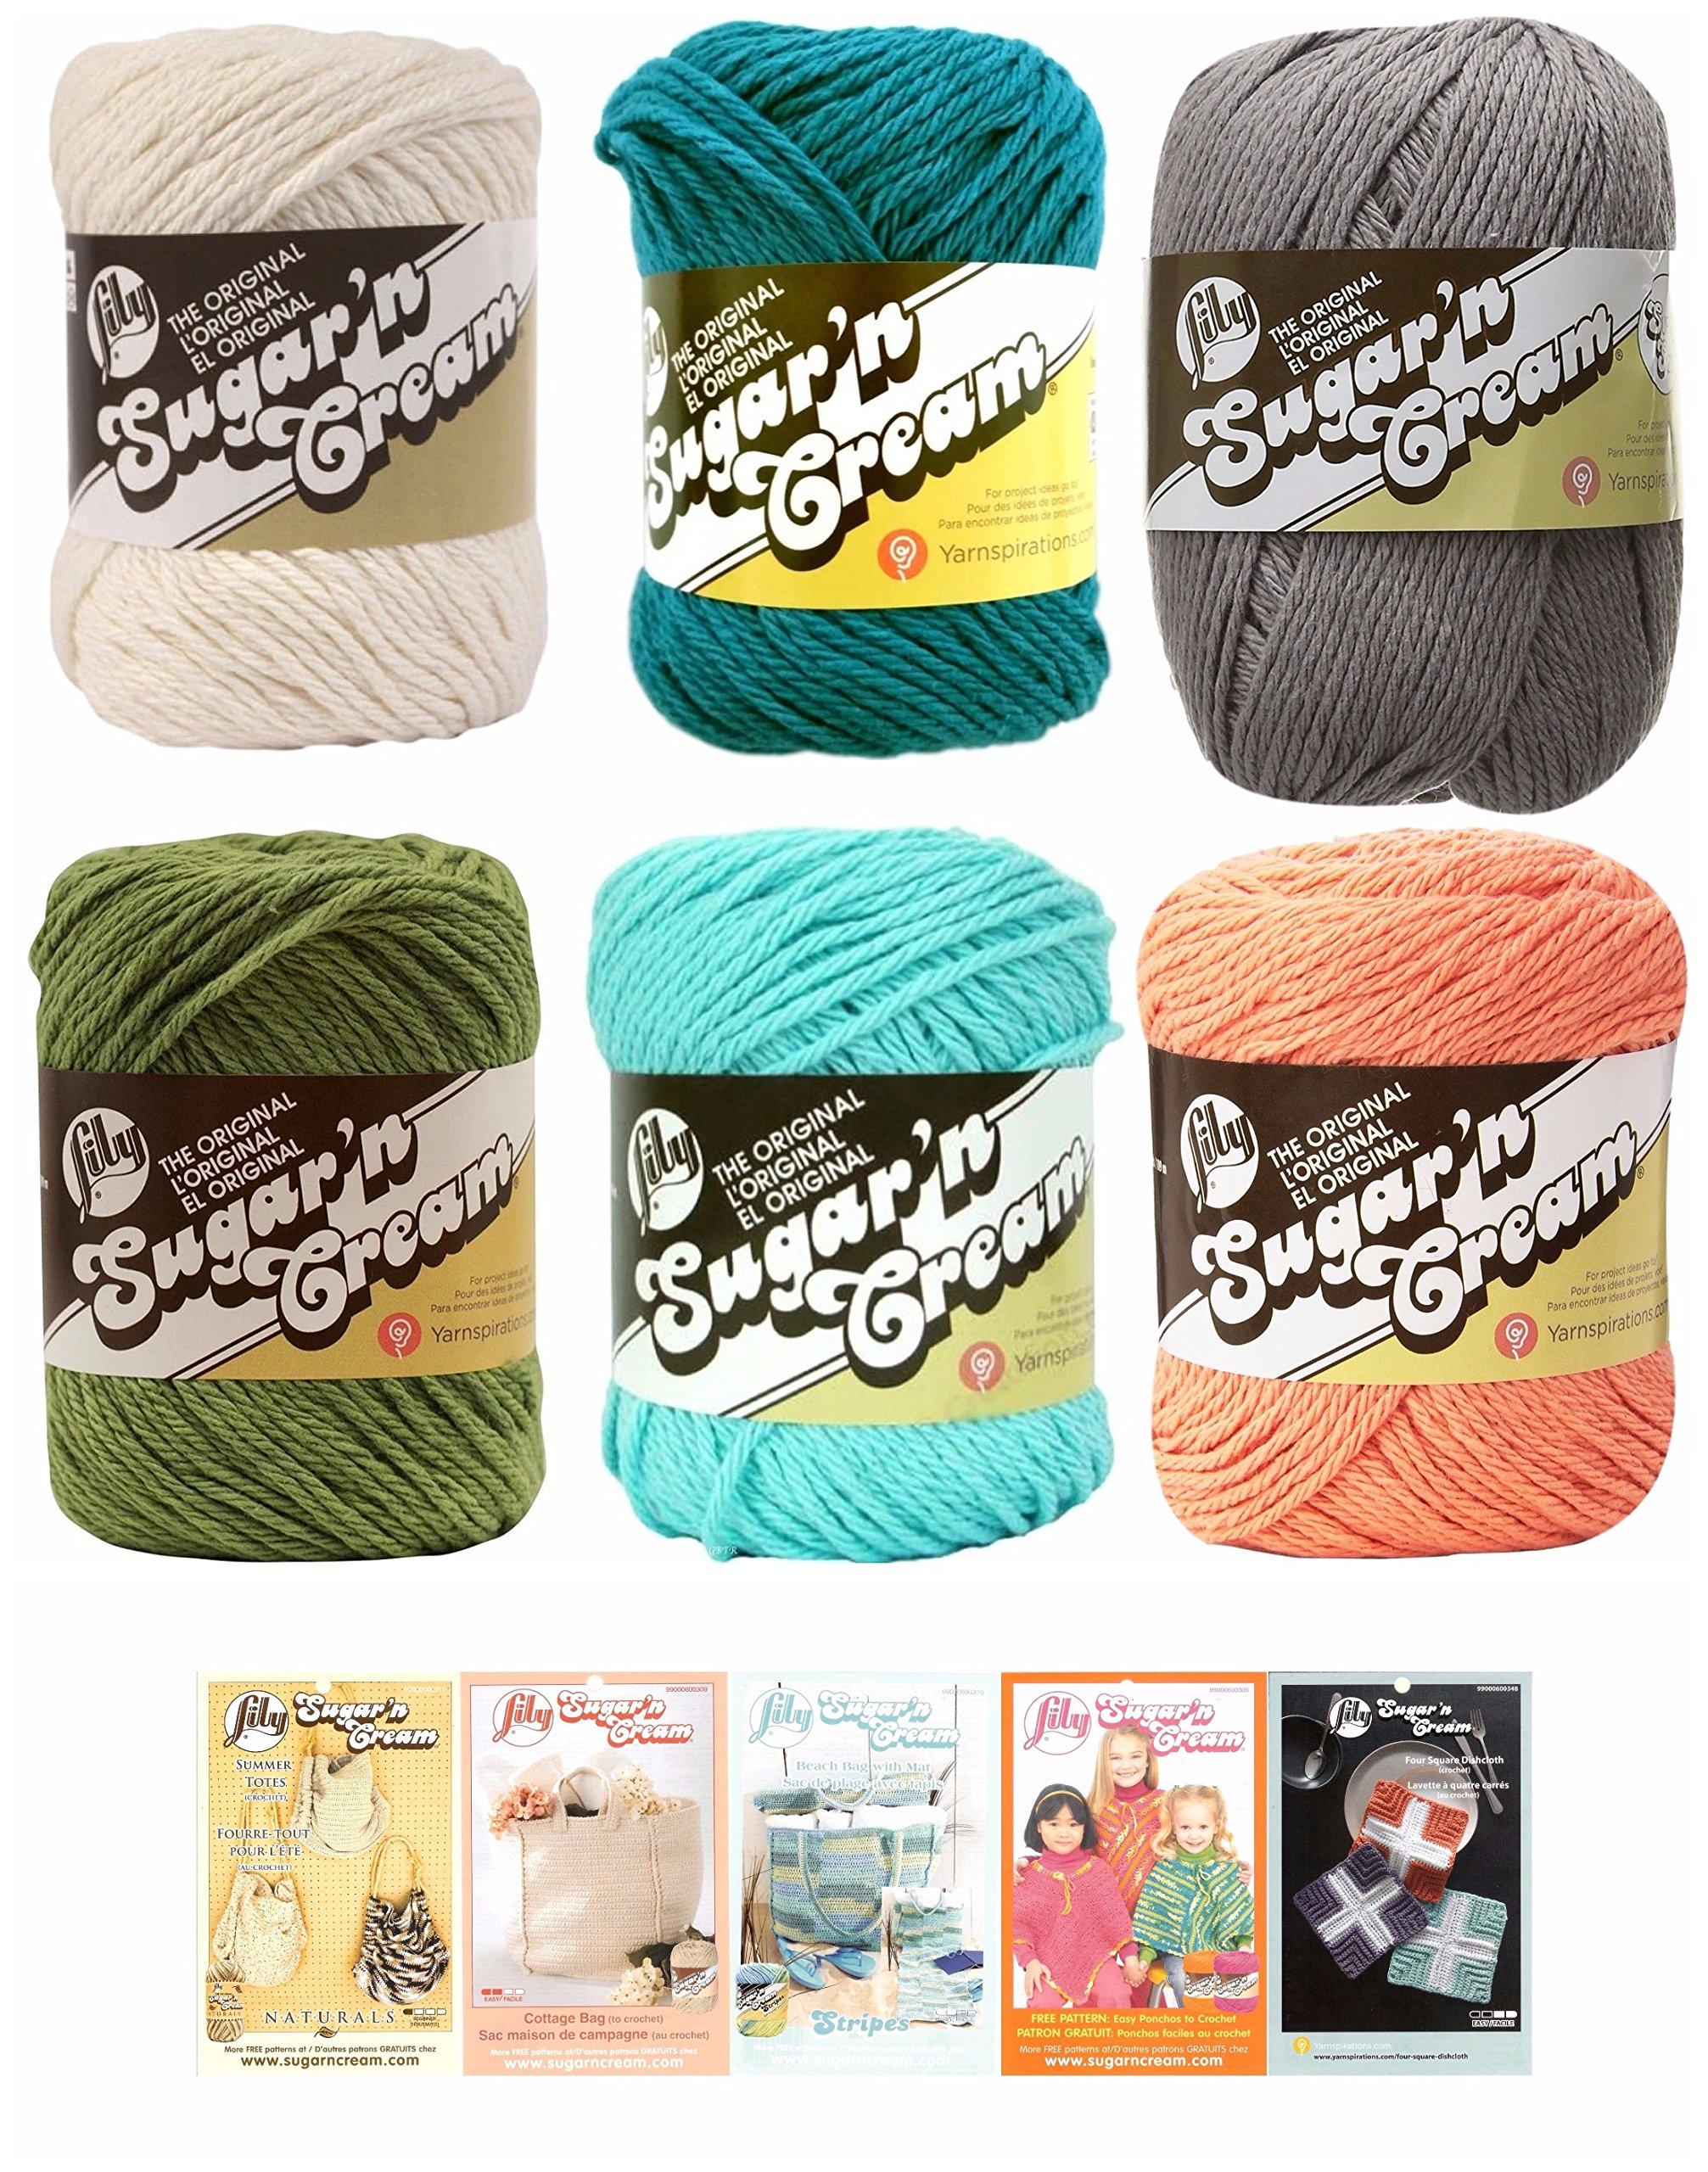 Lily Sugar N Cream Variety Assortment 6 Pack Yarn Bundle With 5